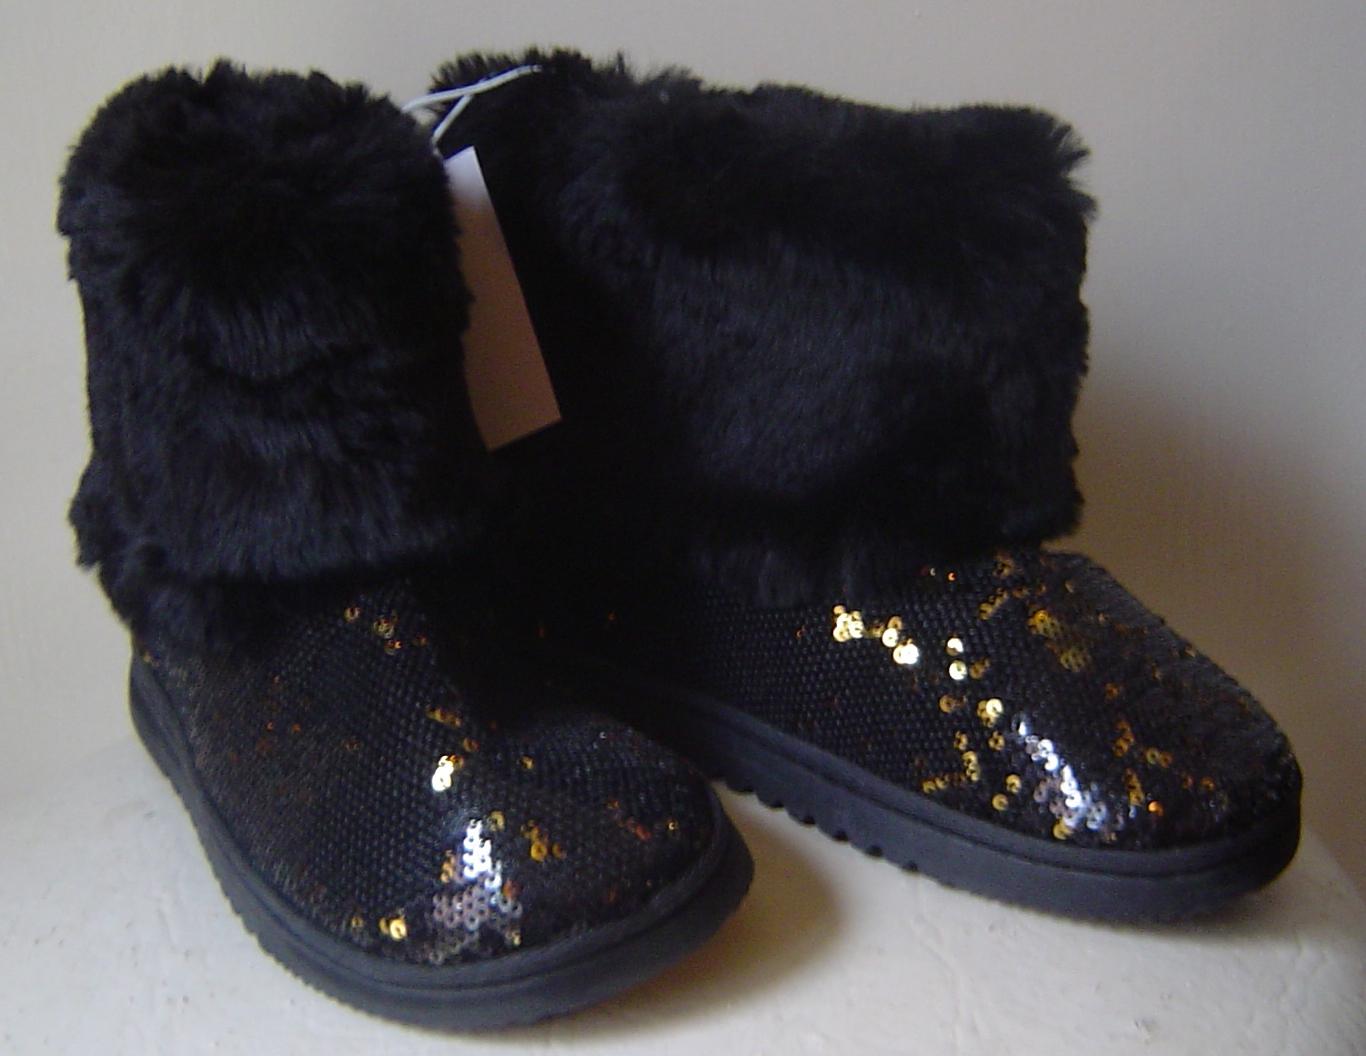 Dearfoams Black Fur Boots Women's Size 5-6  w/Gold & Black Sequins